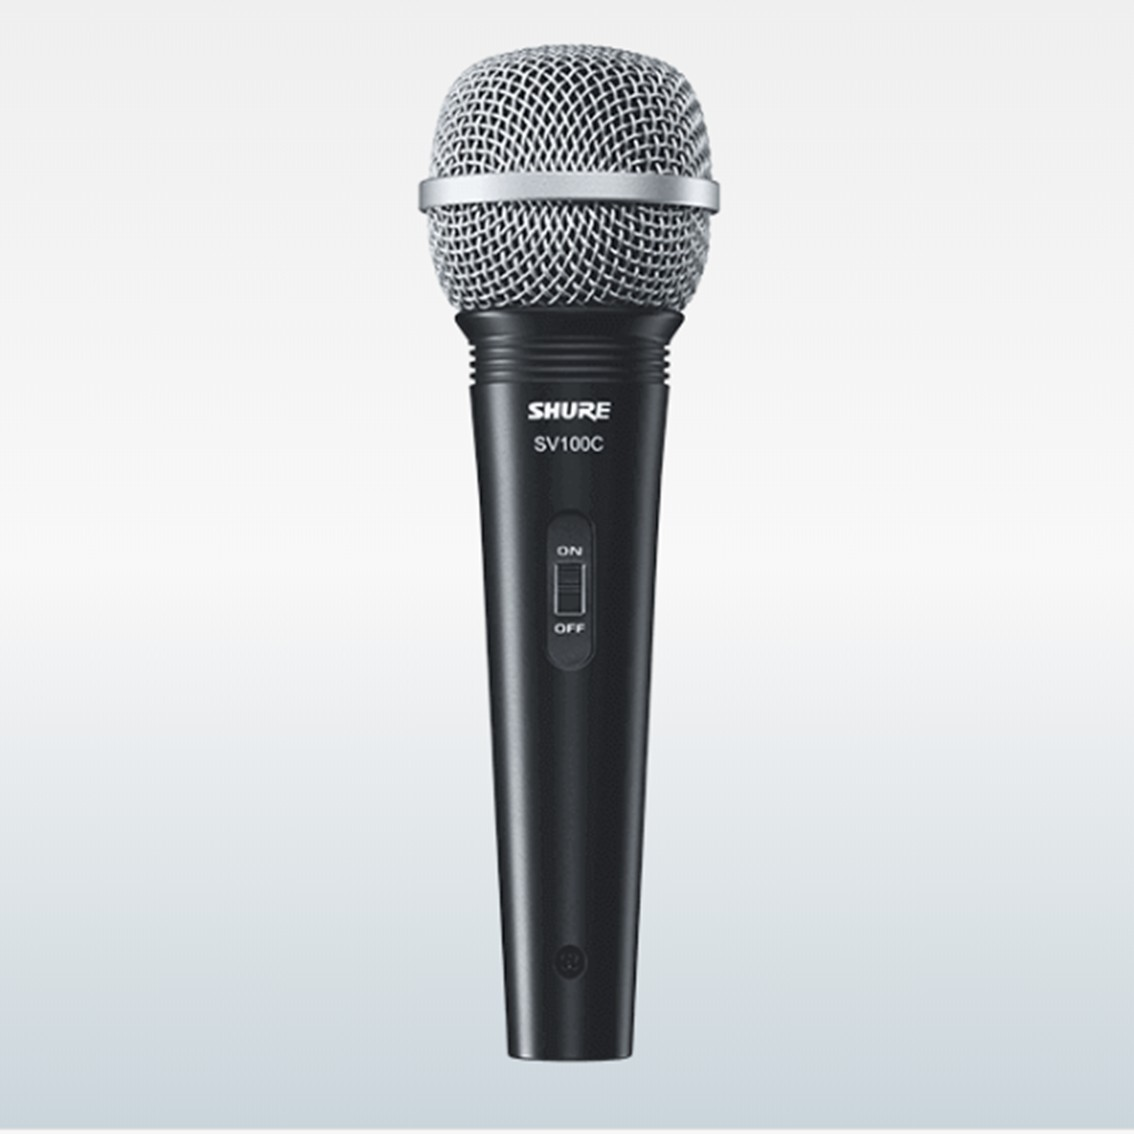 Imagem do produto Microfone Shure SV100